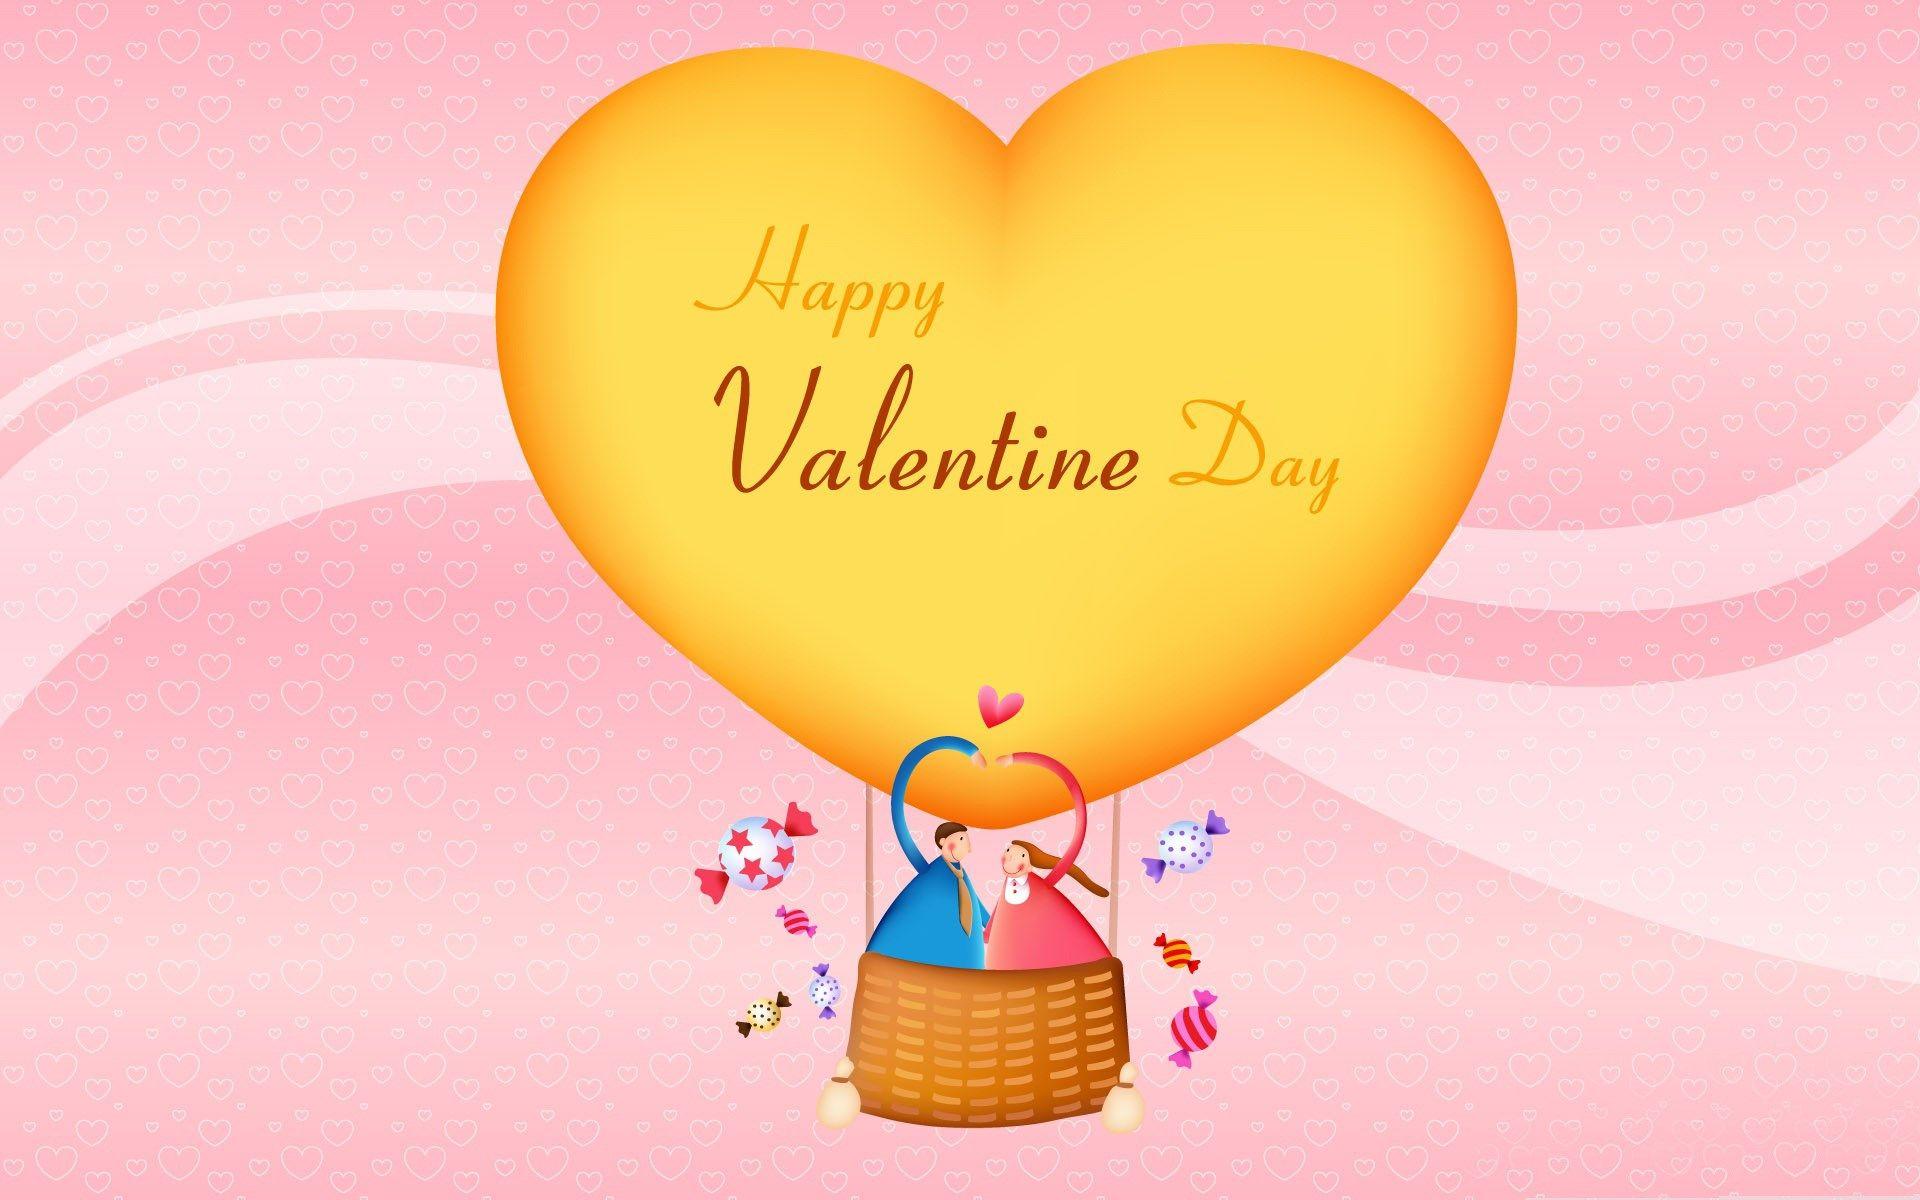 Valentines Day Desktop Wallpaper Sharovarka Pinterest